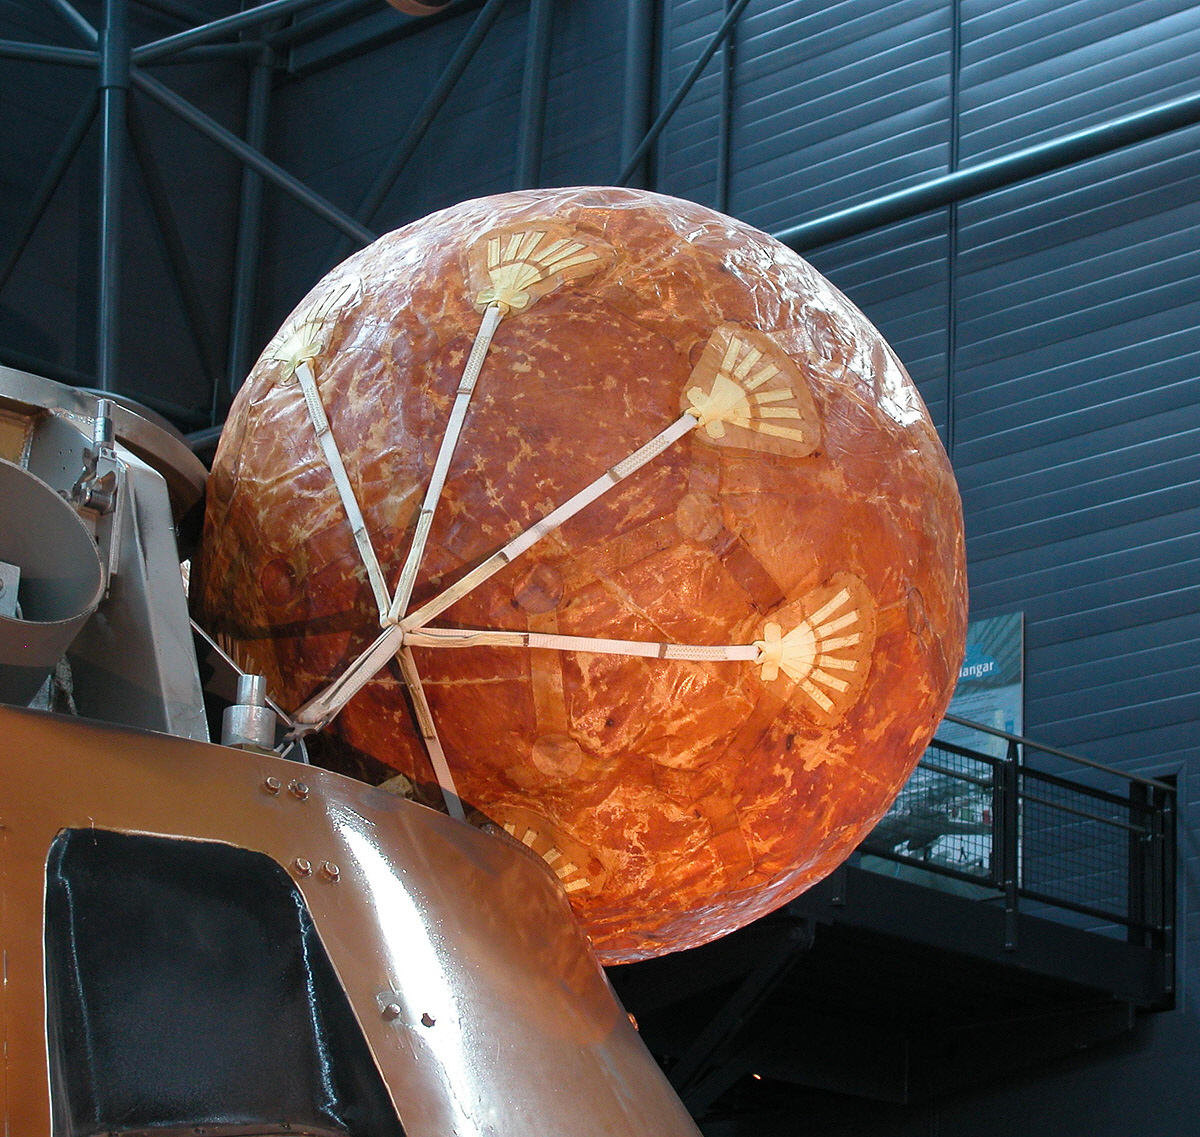 images for Flotation Bag, Apollo 11